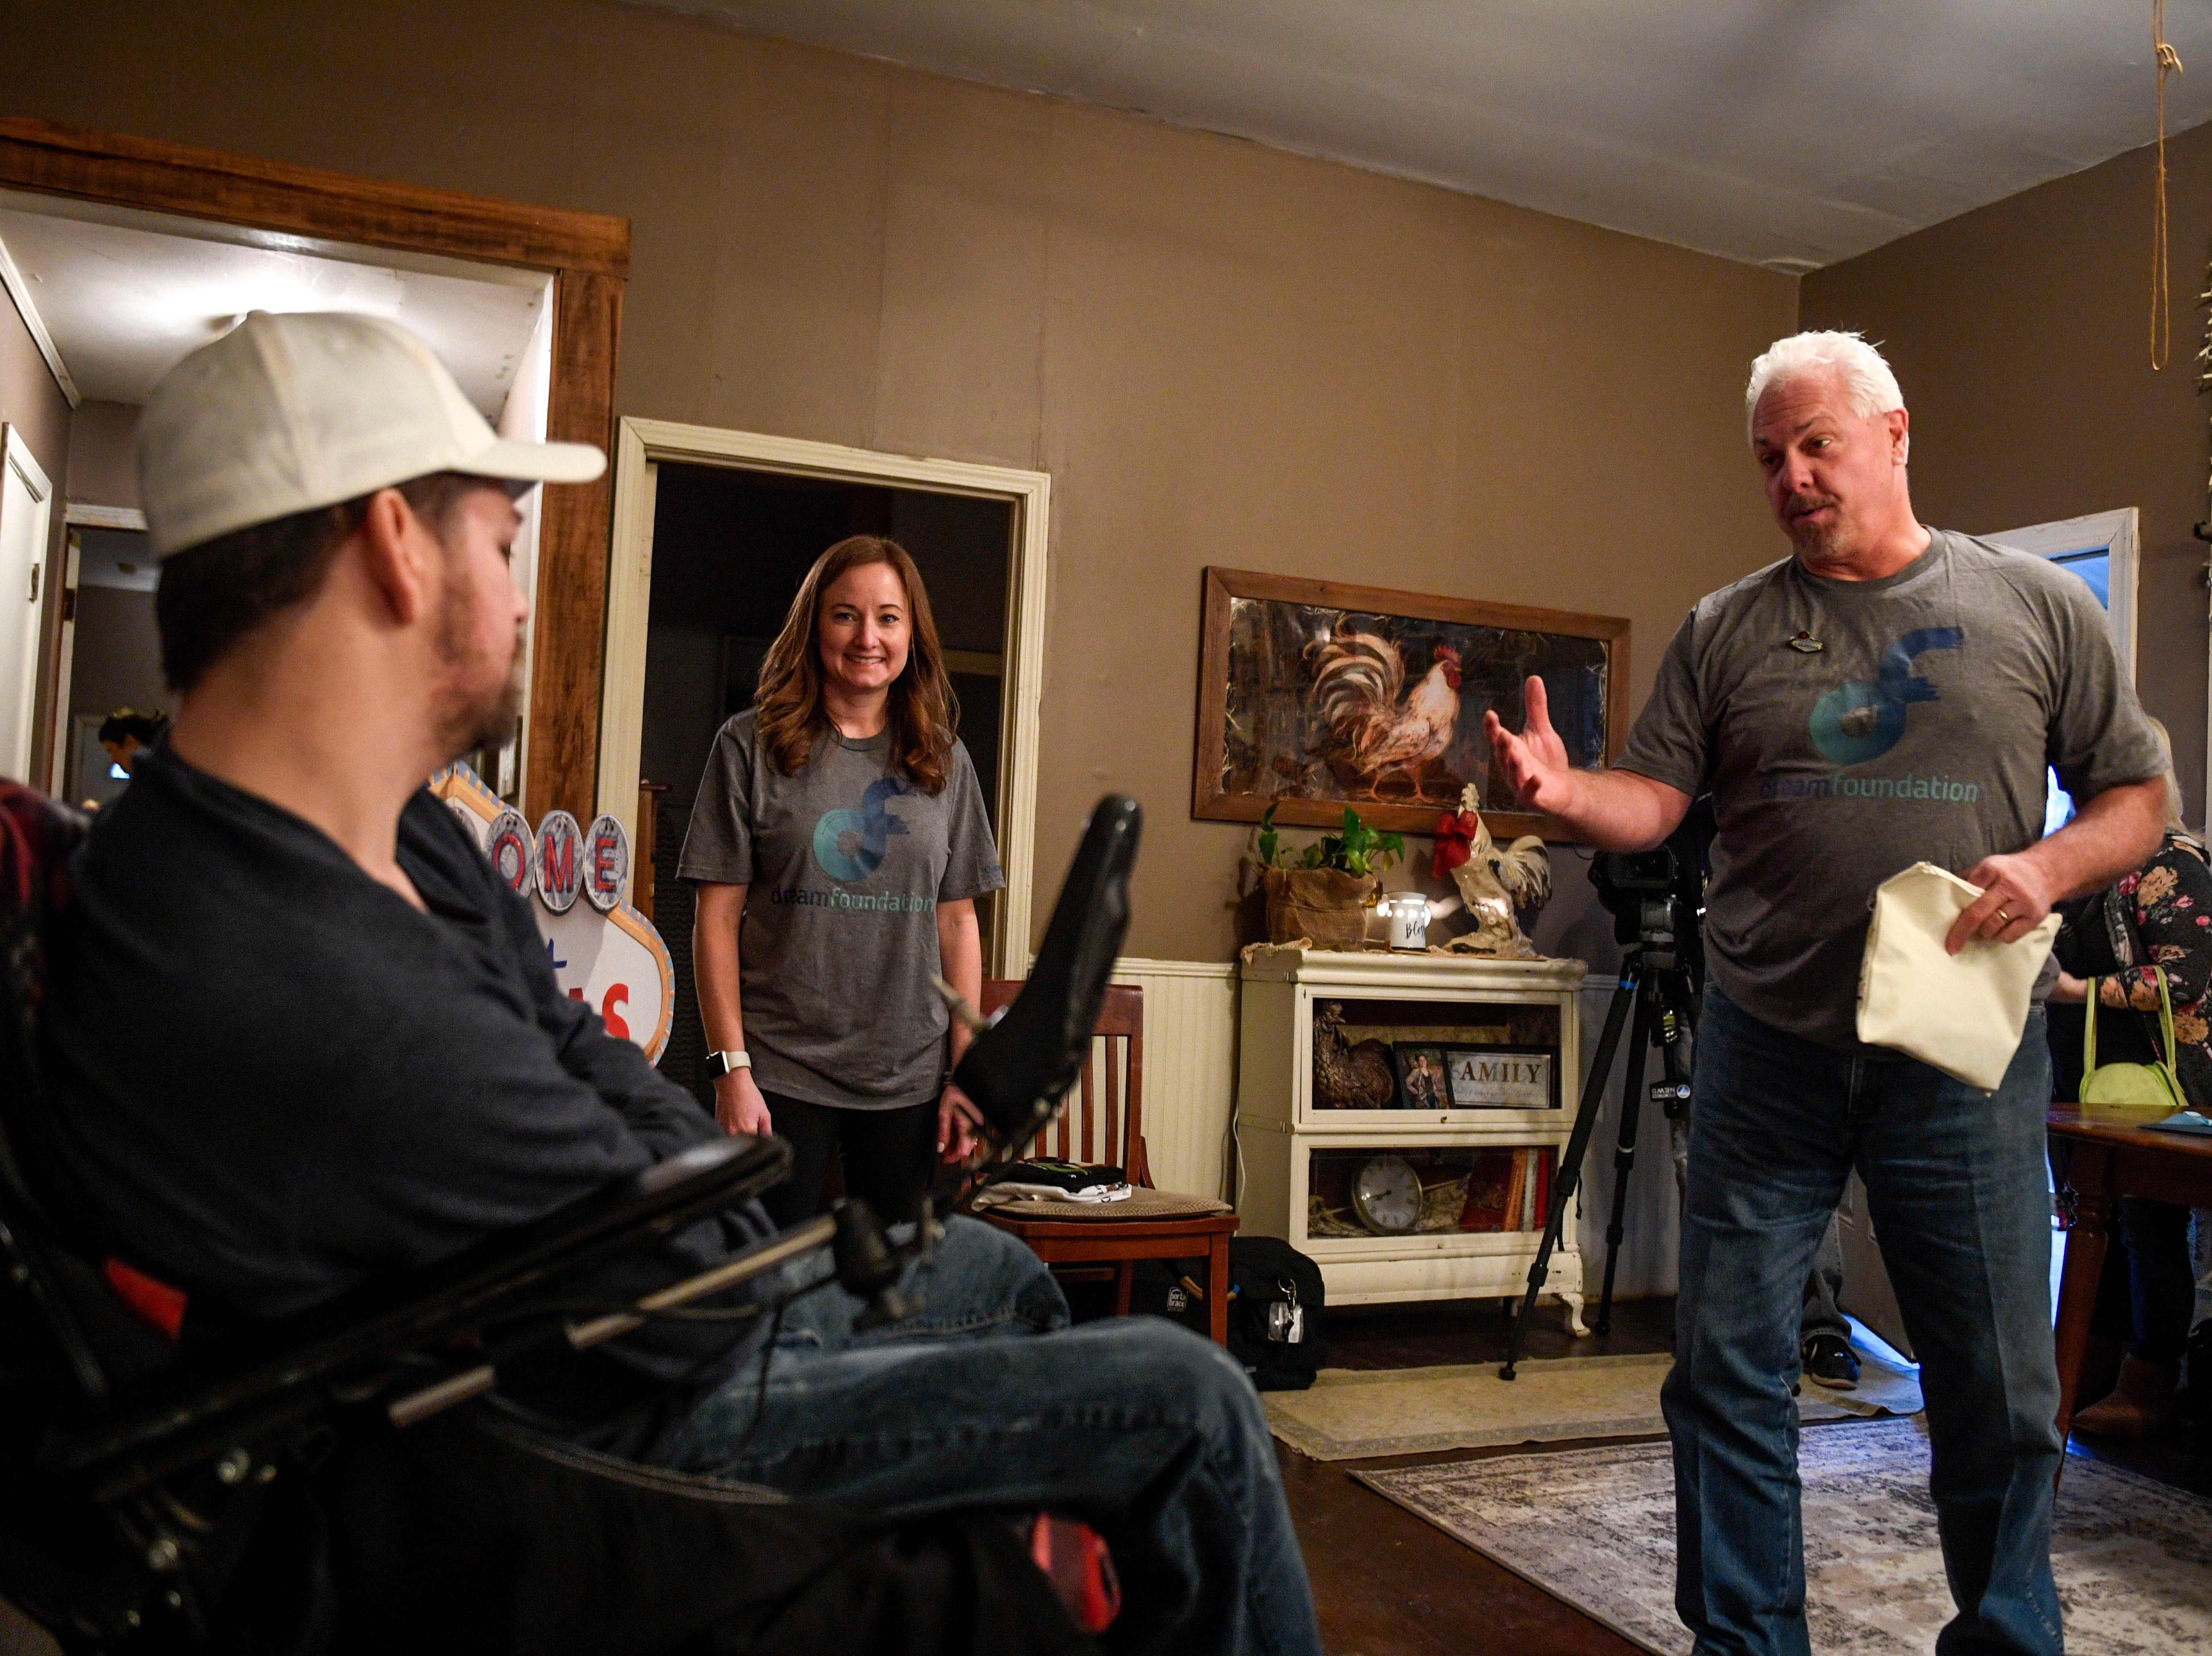 Chuk Lamberth describes Zachary Butler's trip to Vegas to him at Butler's home in Trezevant, Tenn., on Wednesday, Jan. 23, 2019.